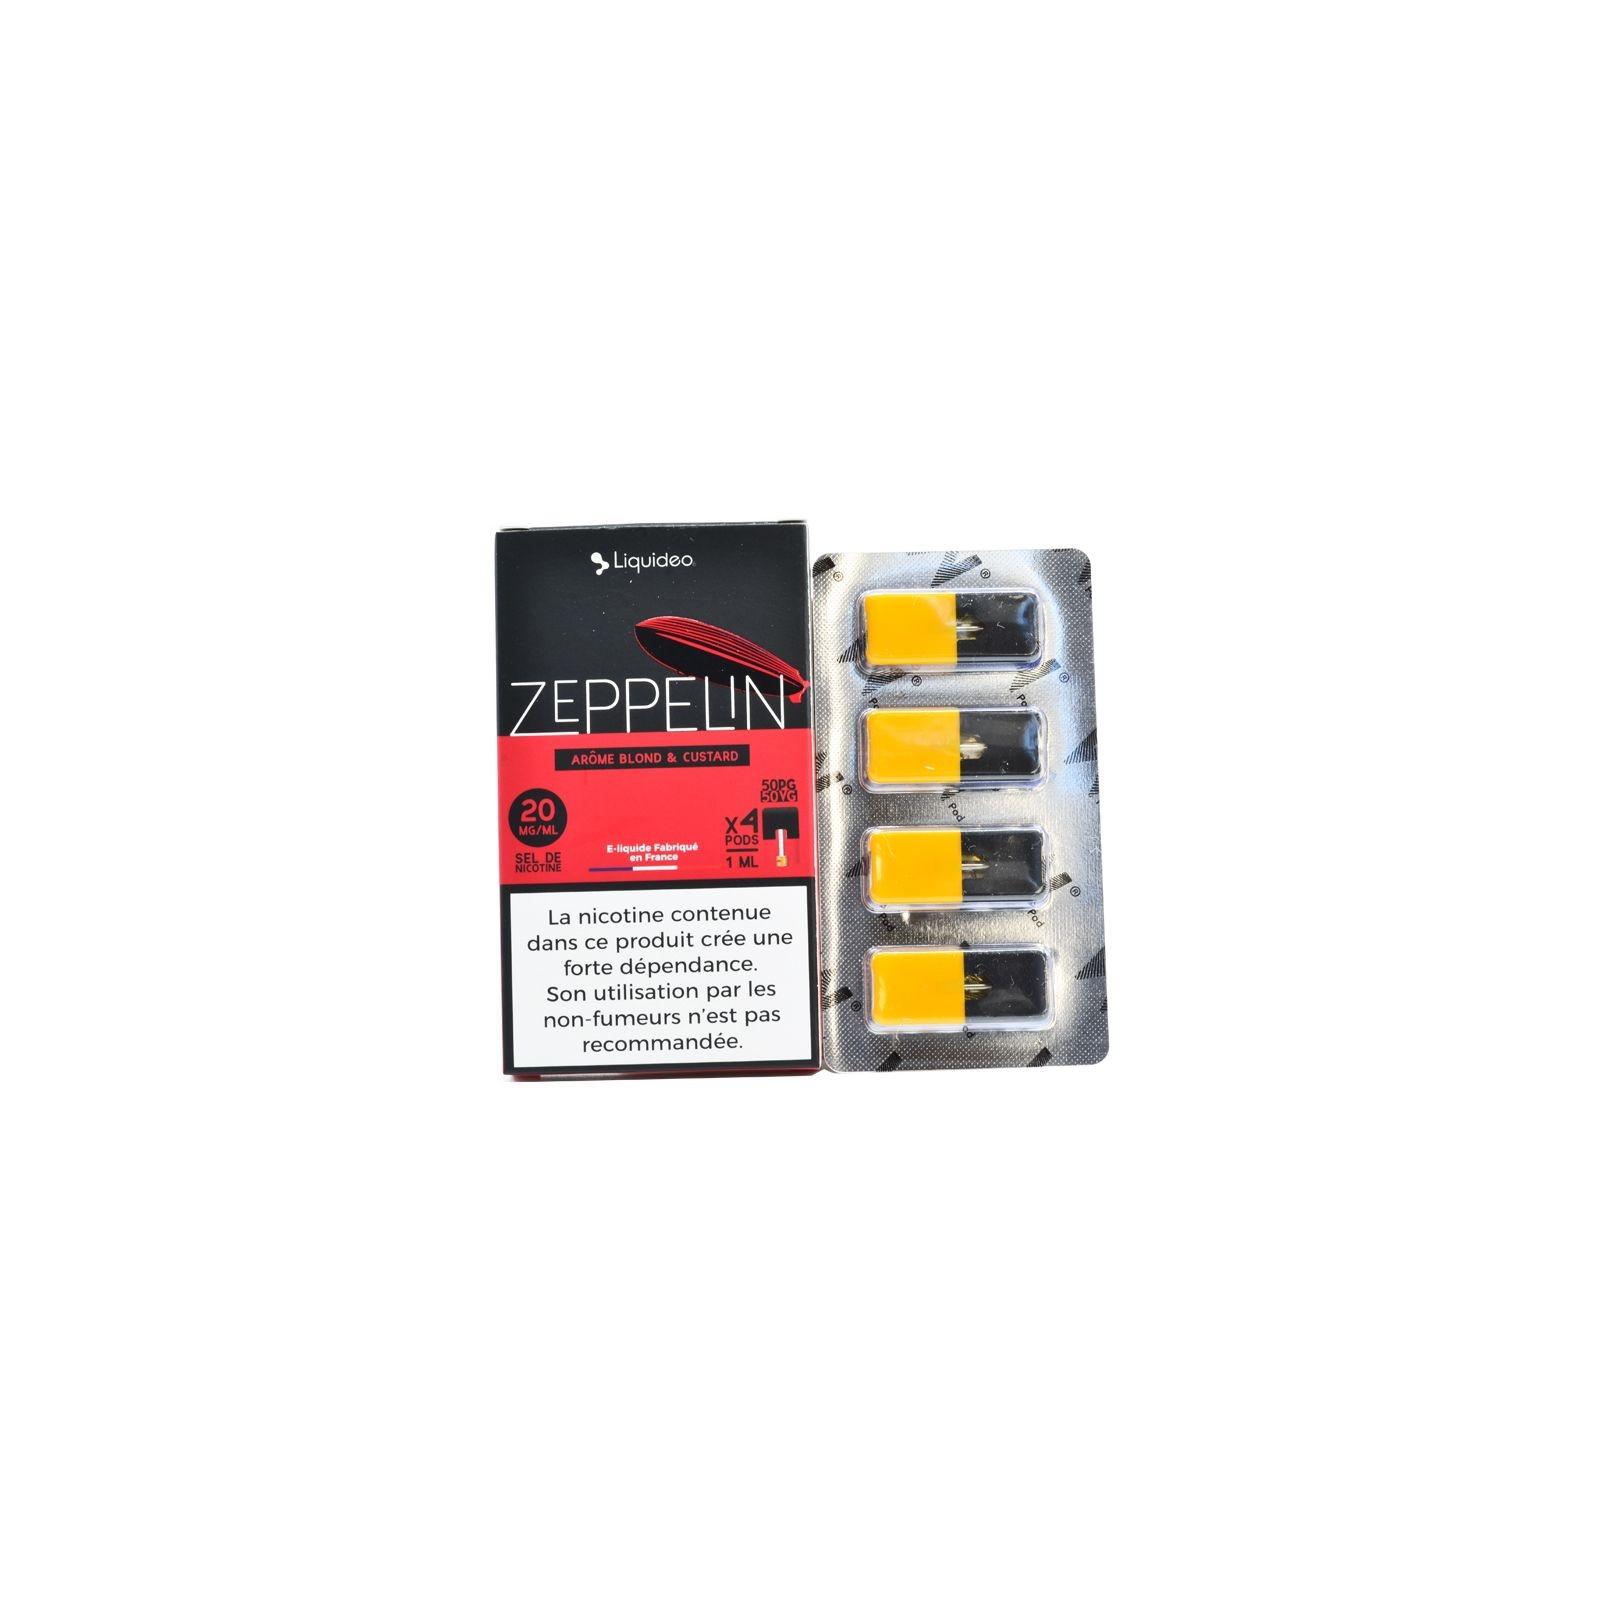 Cartouche Zeppelin Liquideo - W Pod